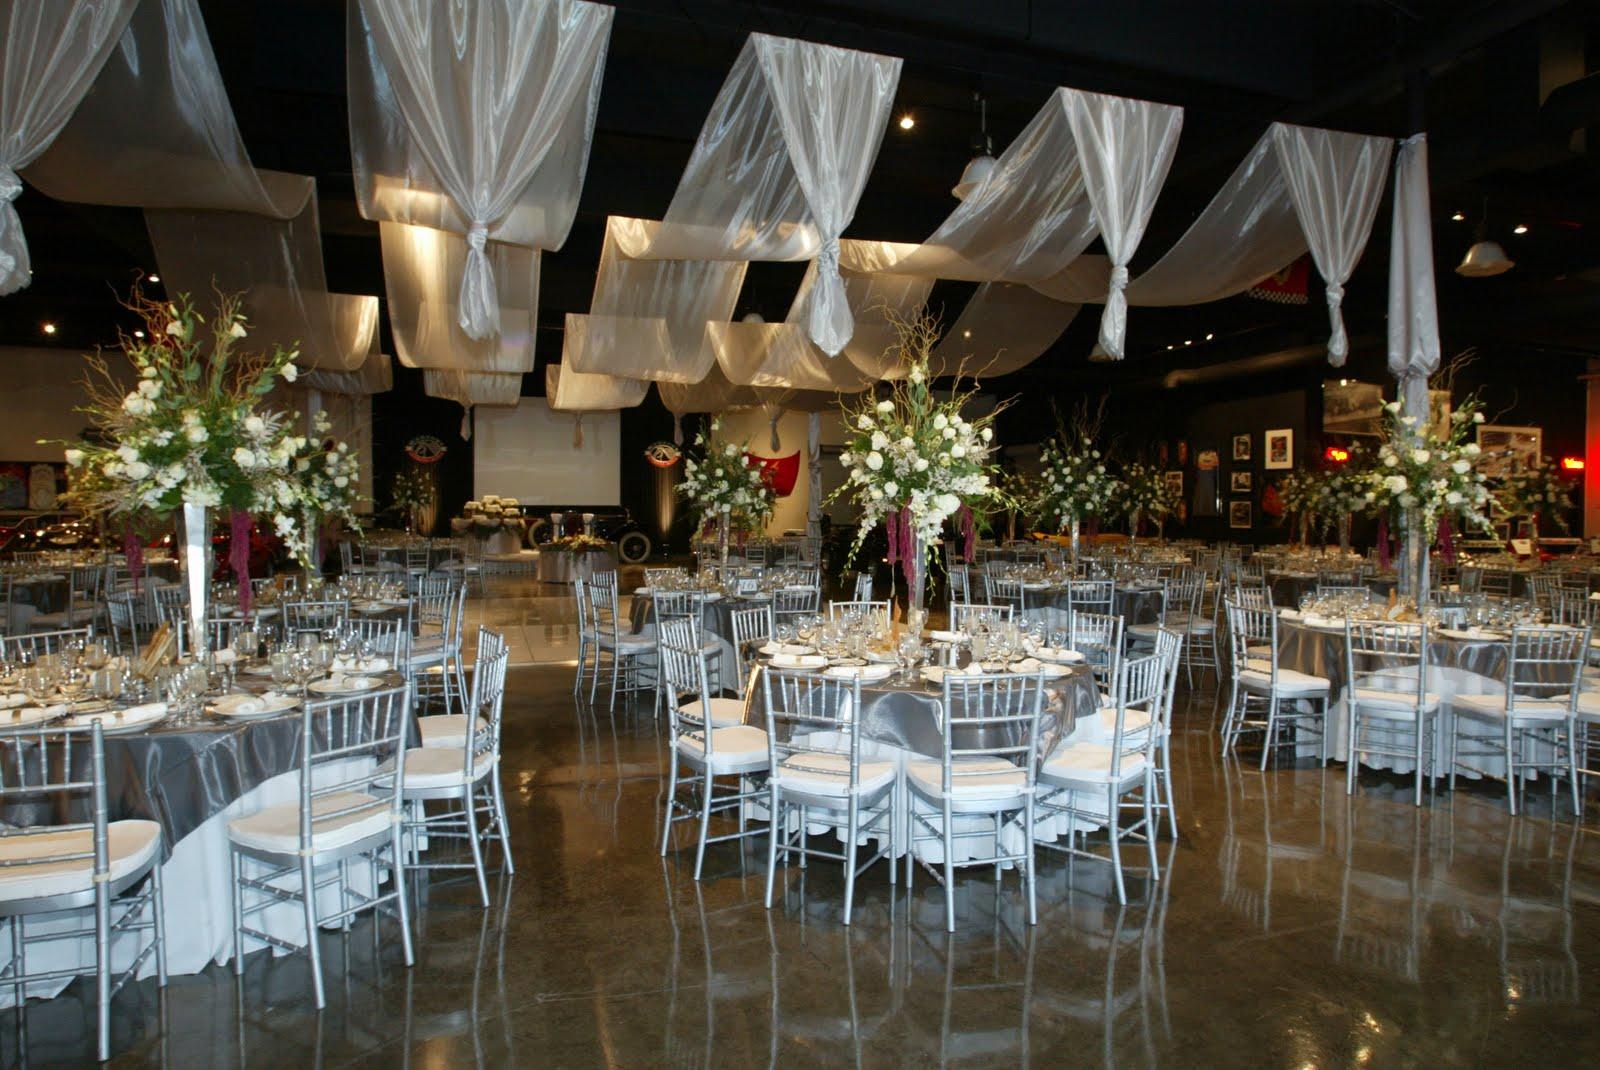 How to decorate wedding reception living room interior designs